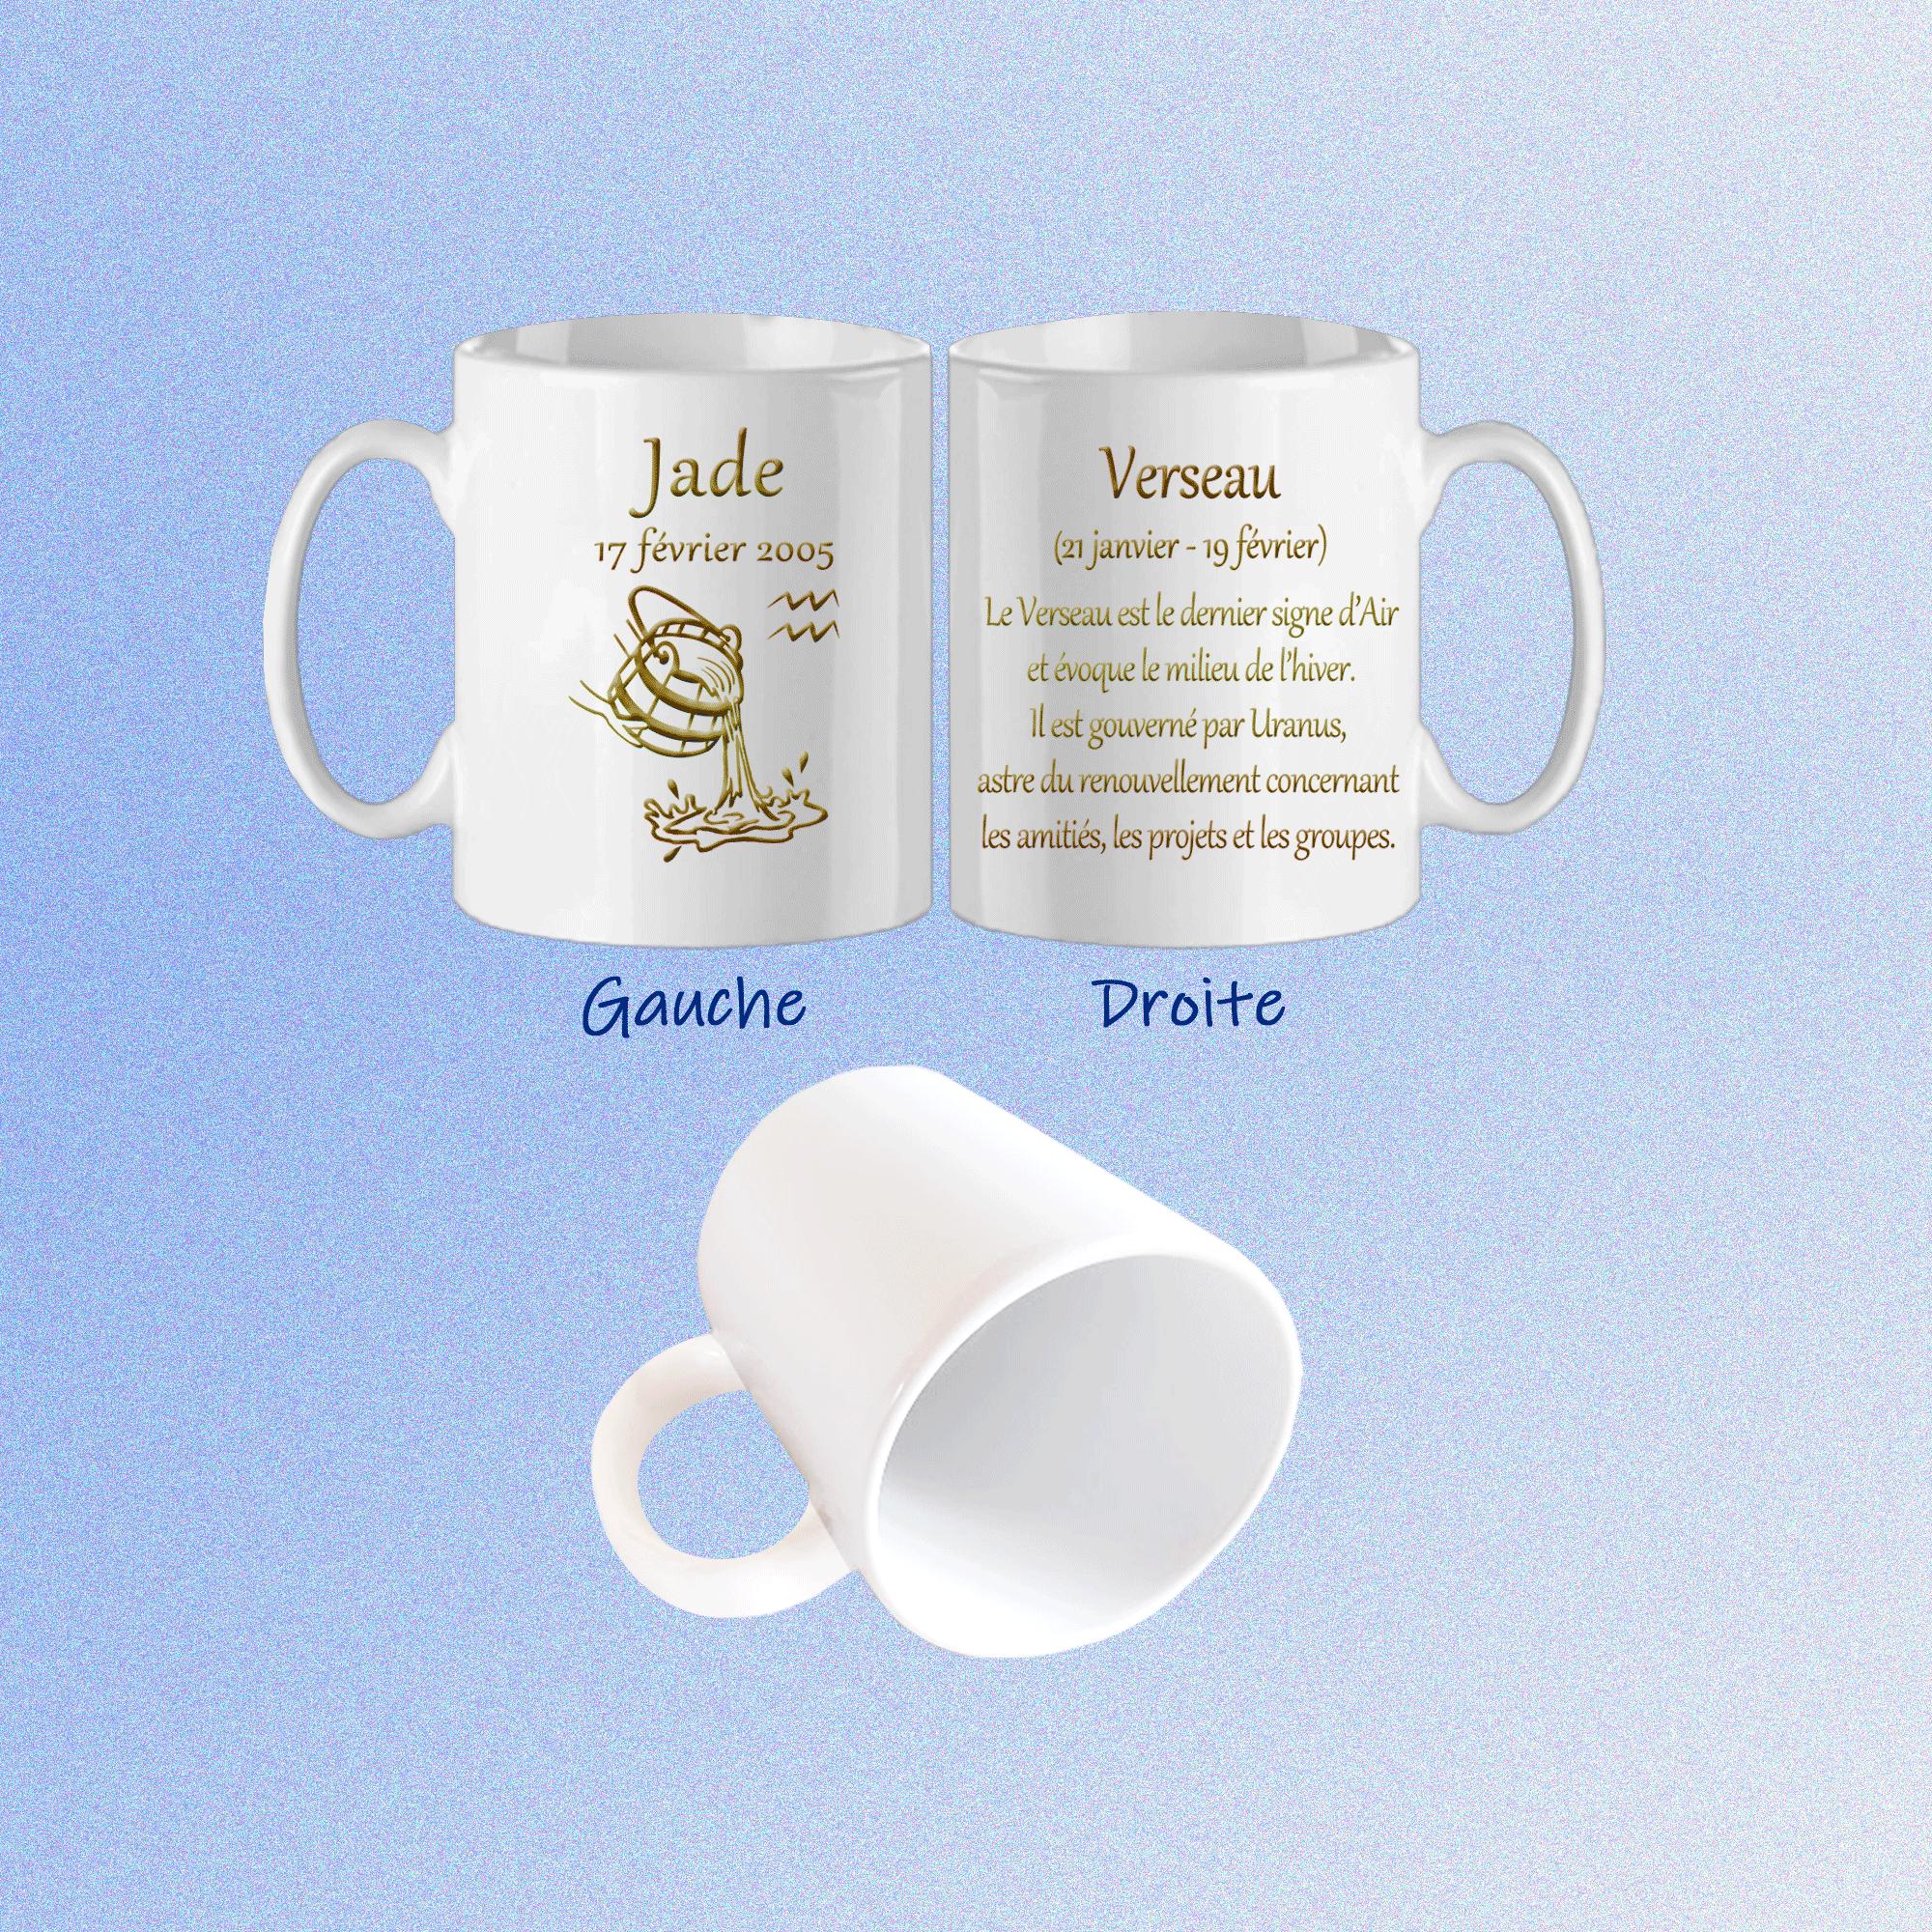 mug-texticadeaux-blanc-astrologie-zodiaque-verseau-personnalise-personnalisation-personnalisable-date-naissance-prenom-jade